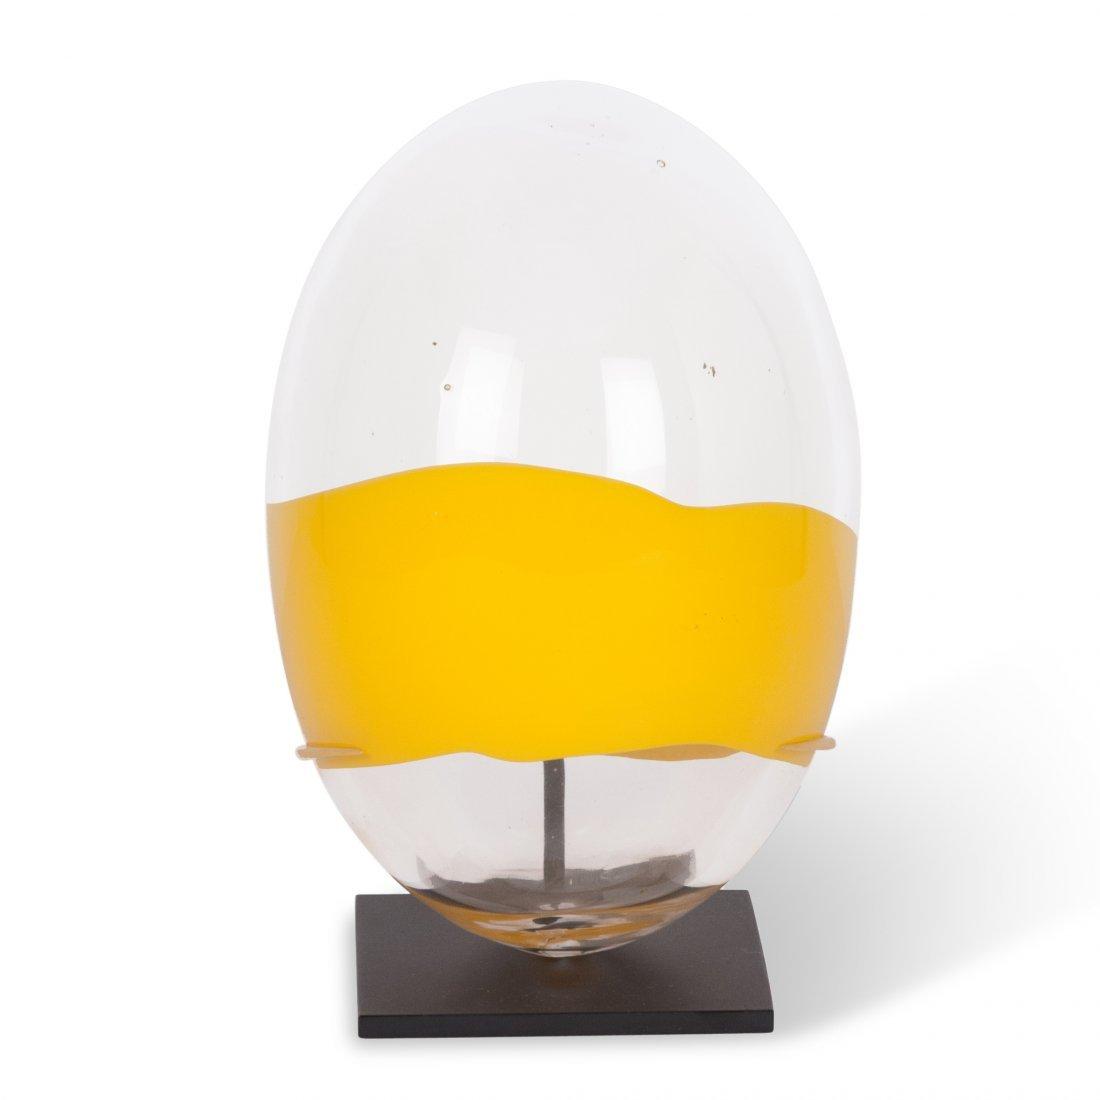 Santillana for Venini for Pierre Cardin Glass Egg